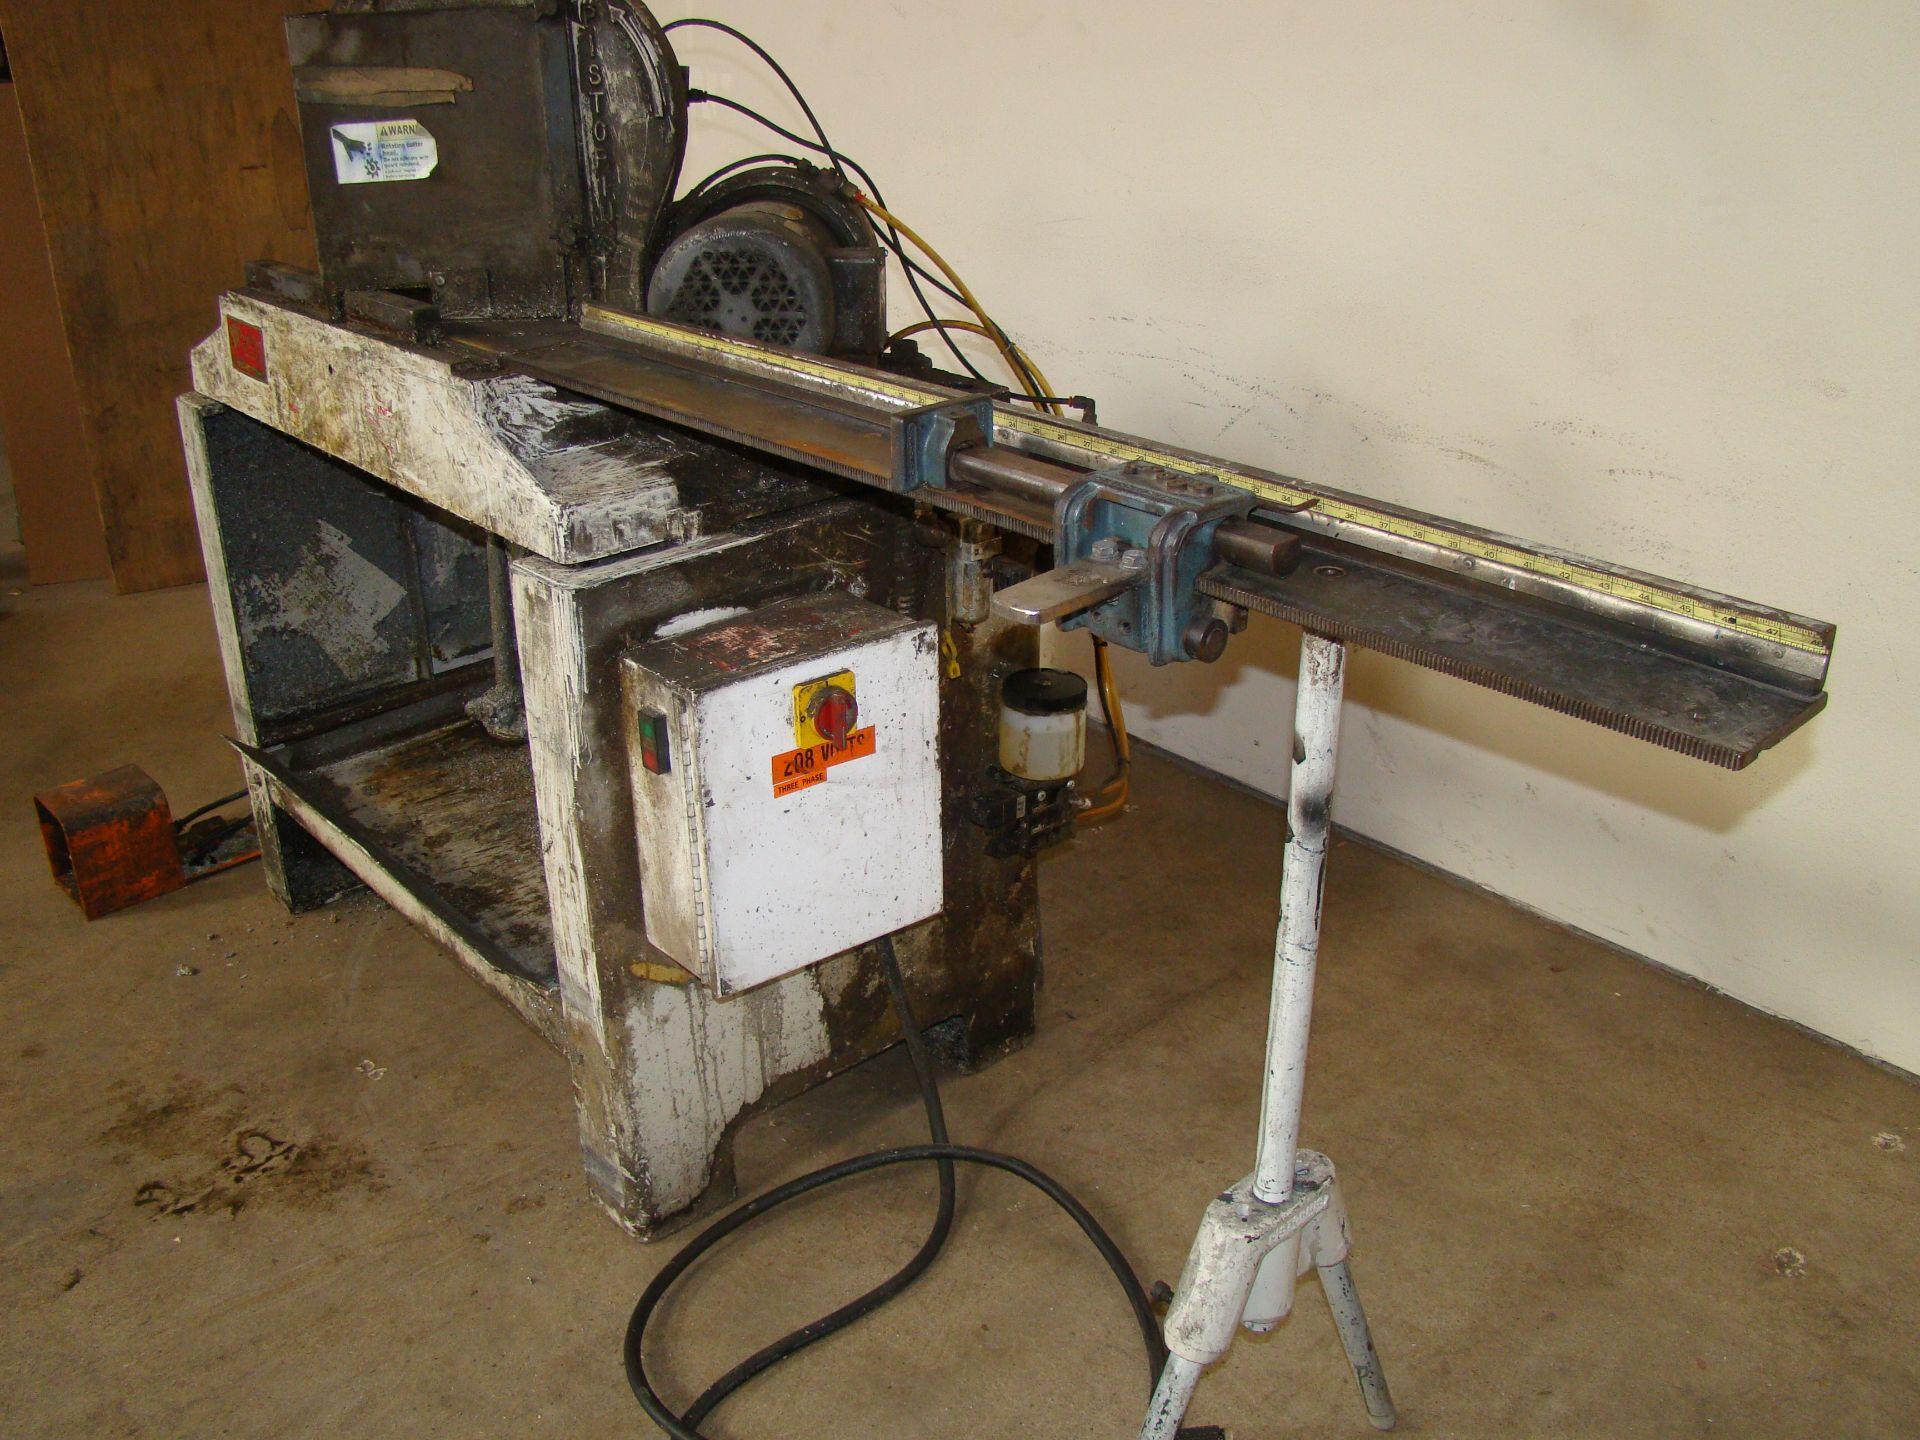 Lot 35 - Pistorius MN-100 Double Miter Cut-off Saw 45 Degree Trim Chop Saw, Has 2 - 1-1/2 HP 230/460 Volt 3PH